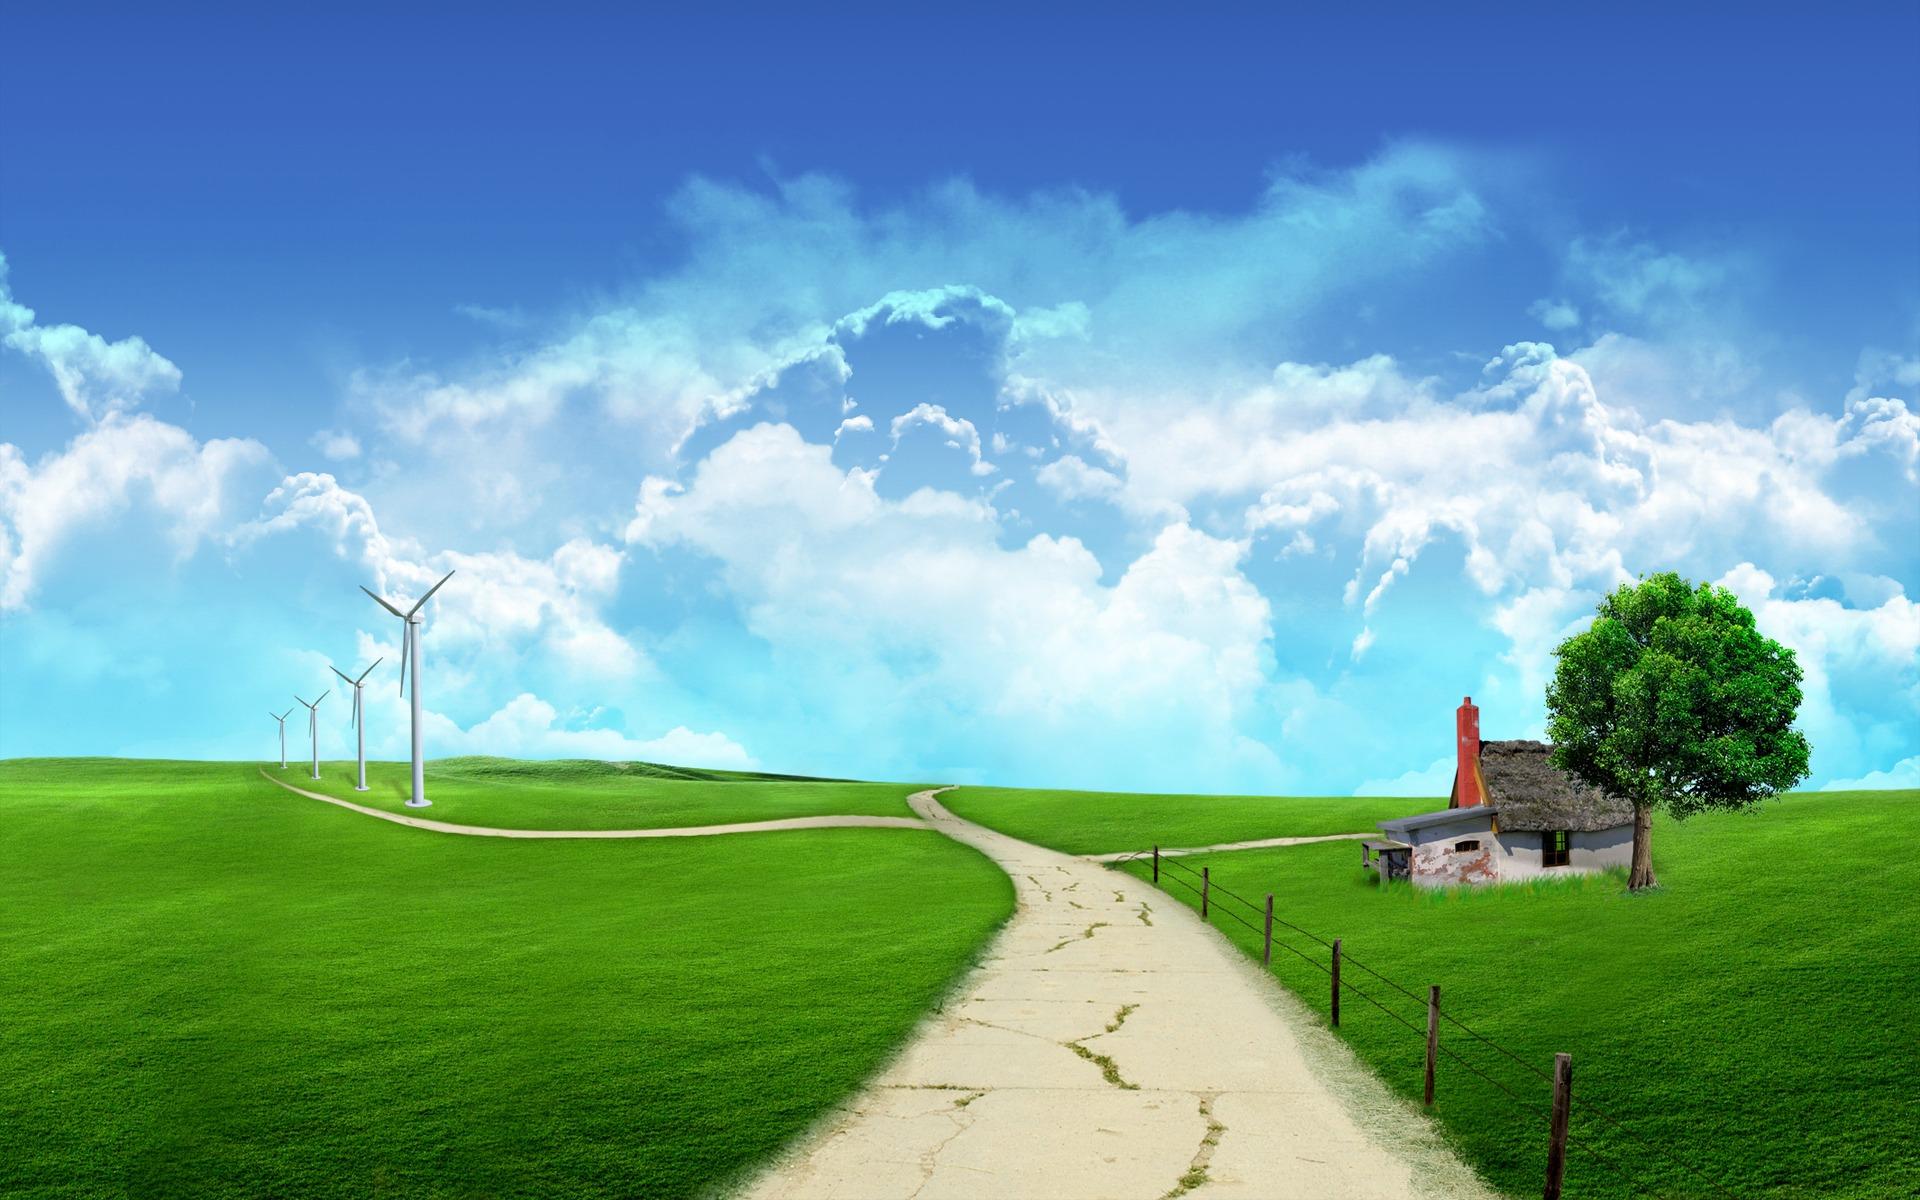 трава, дорога, дома, зеленая трава